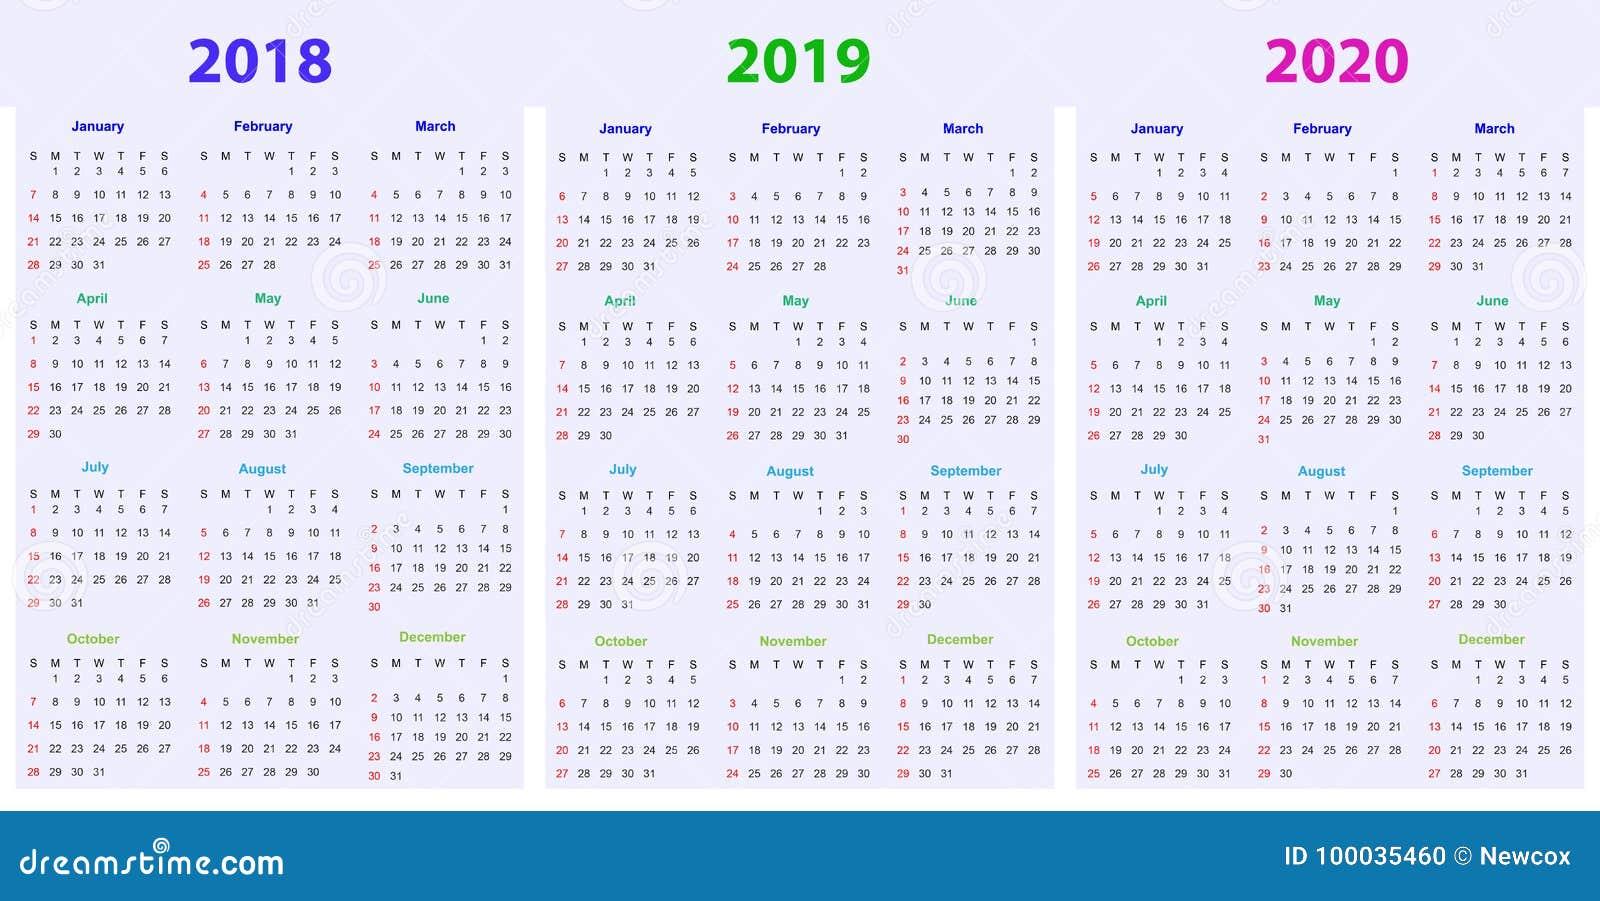 Calendario Maya 2020.12 Months Calendar Design 2018 2019 2020 Stock Vector Illustration